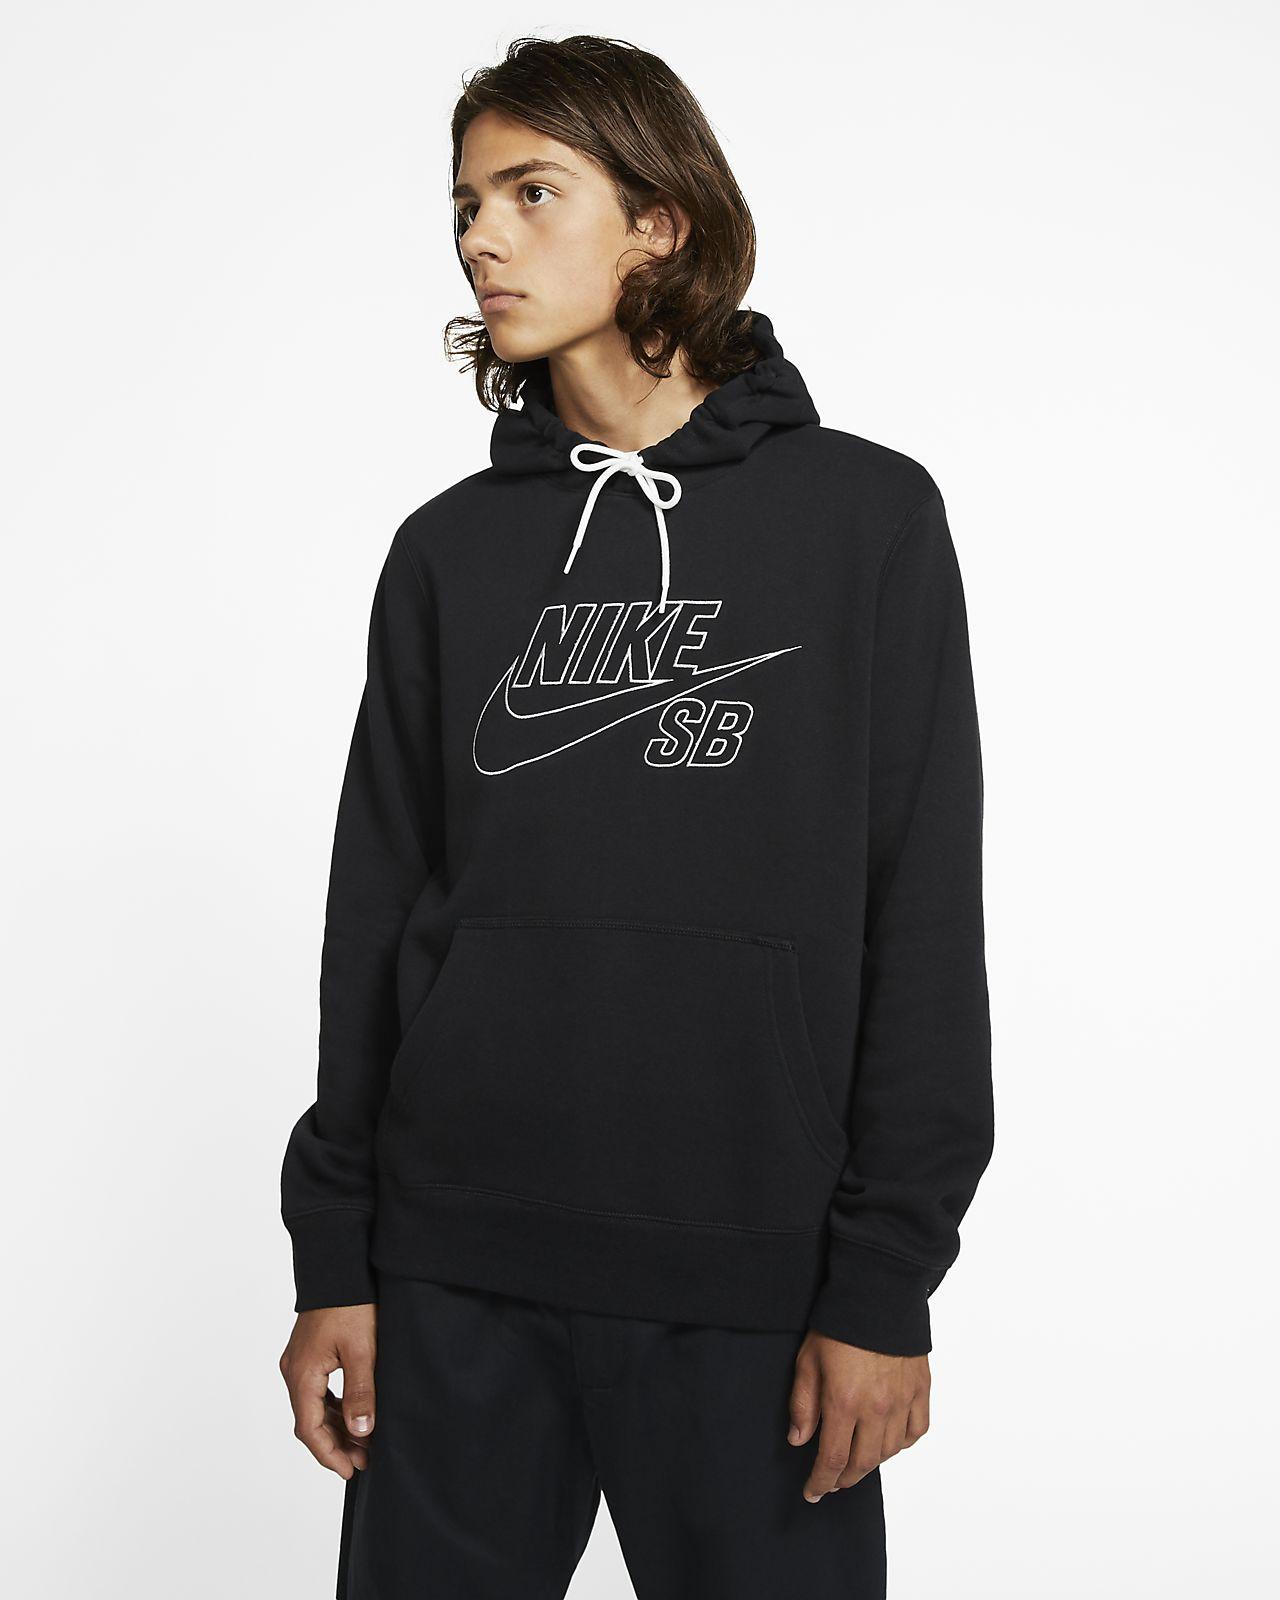 Nike SB Sudadera con capucha de skateboard